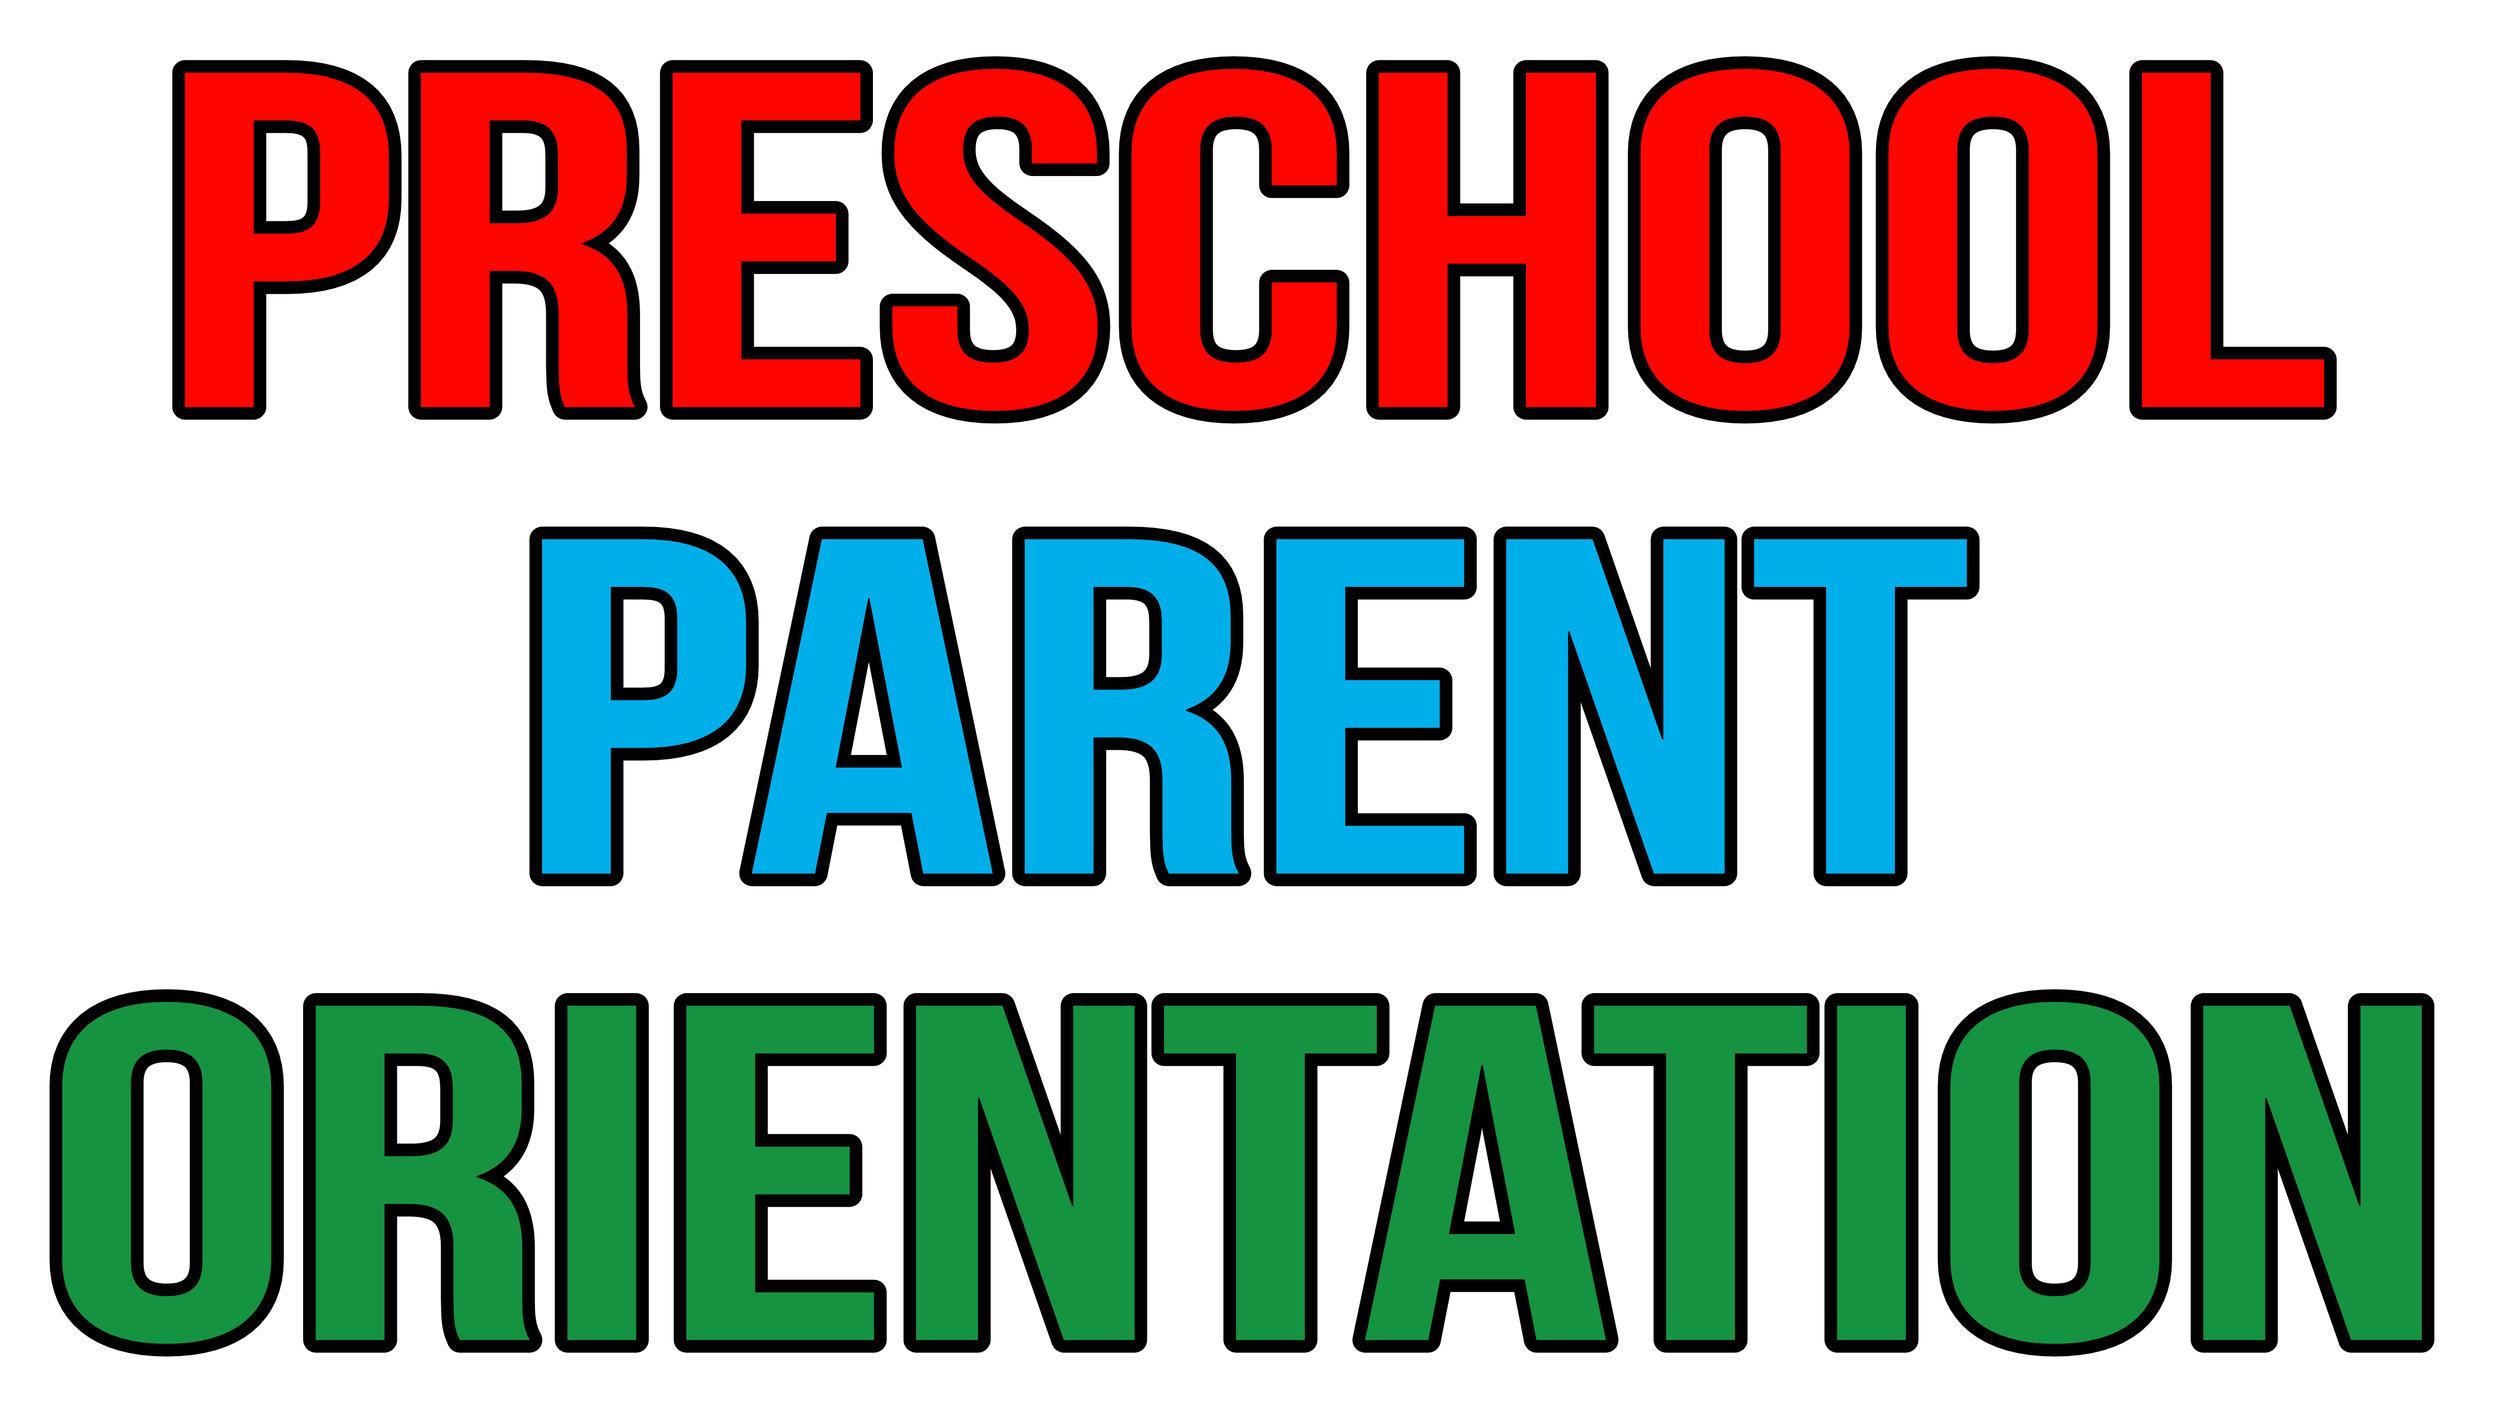 Preschool Parents Orientation Tv Slide.jpg